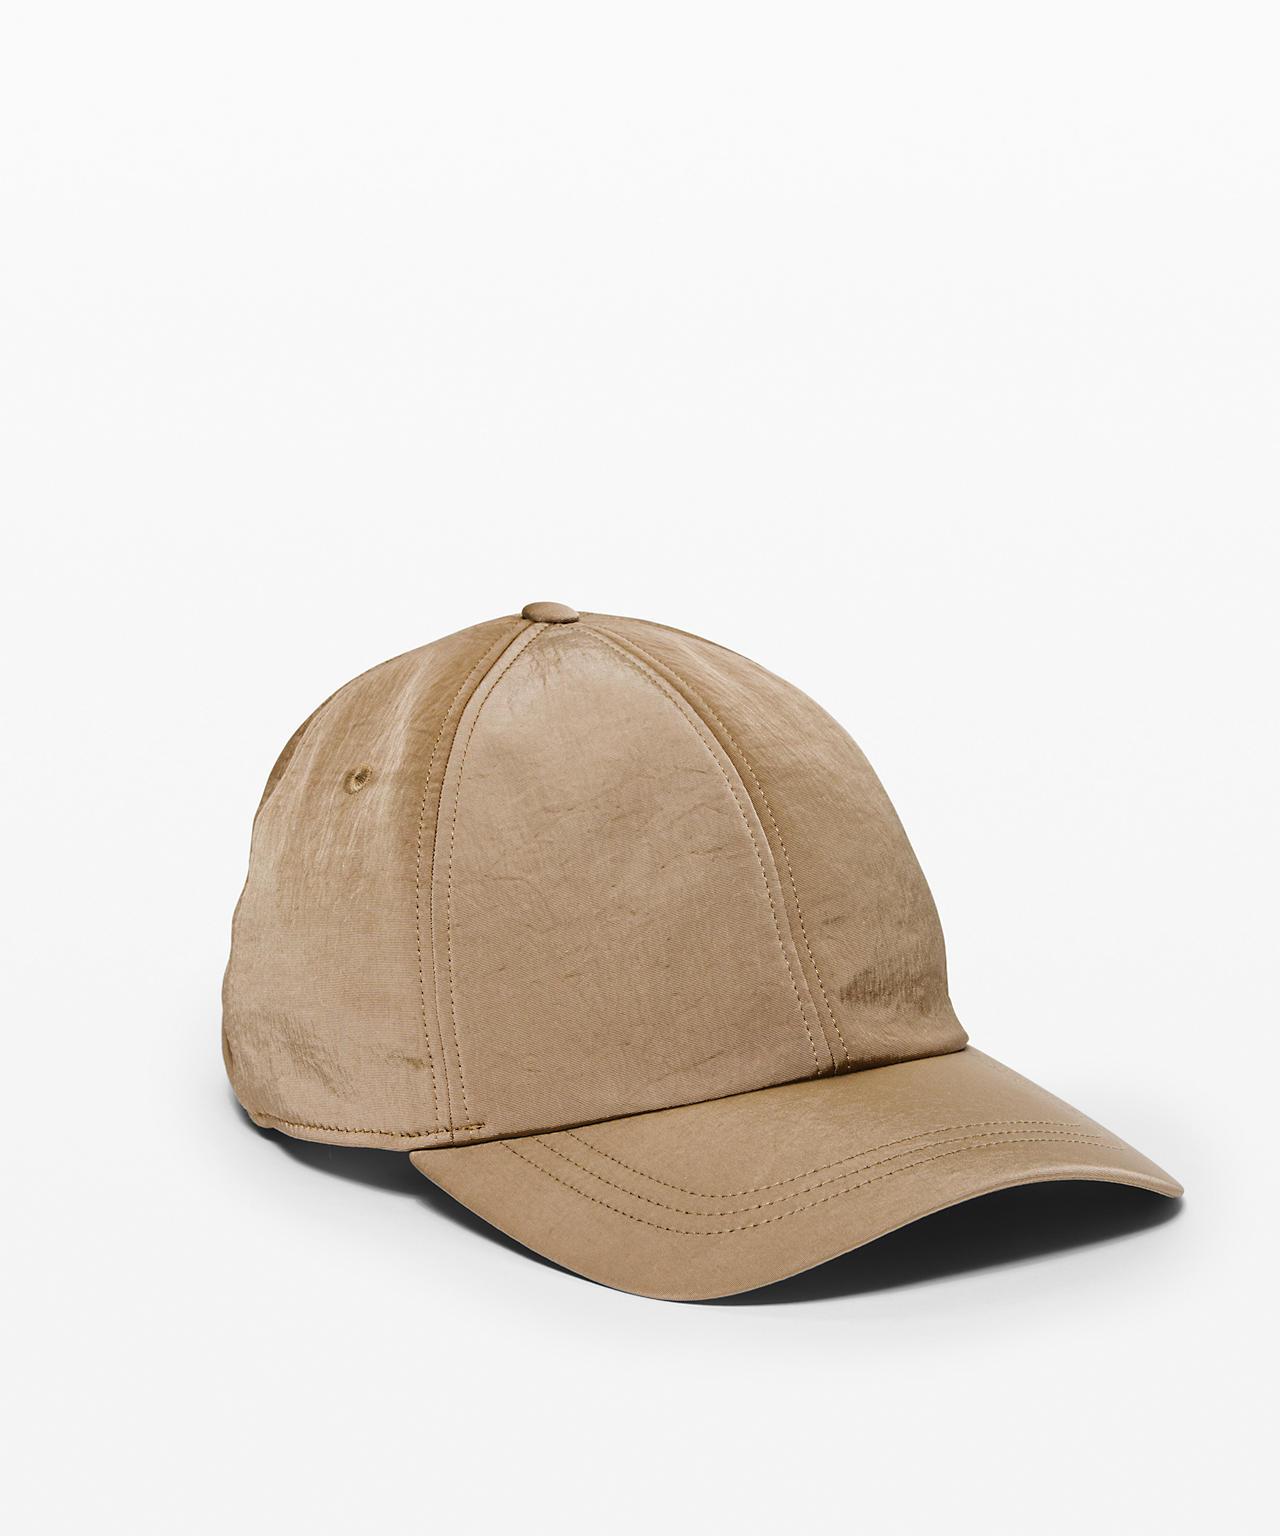 Baller Hat II Soft, Lululemon Upload